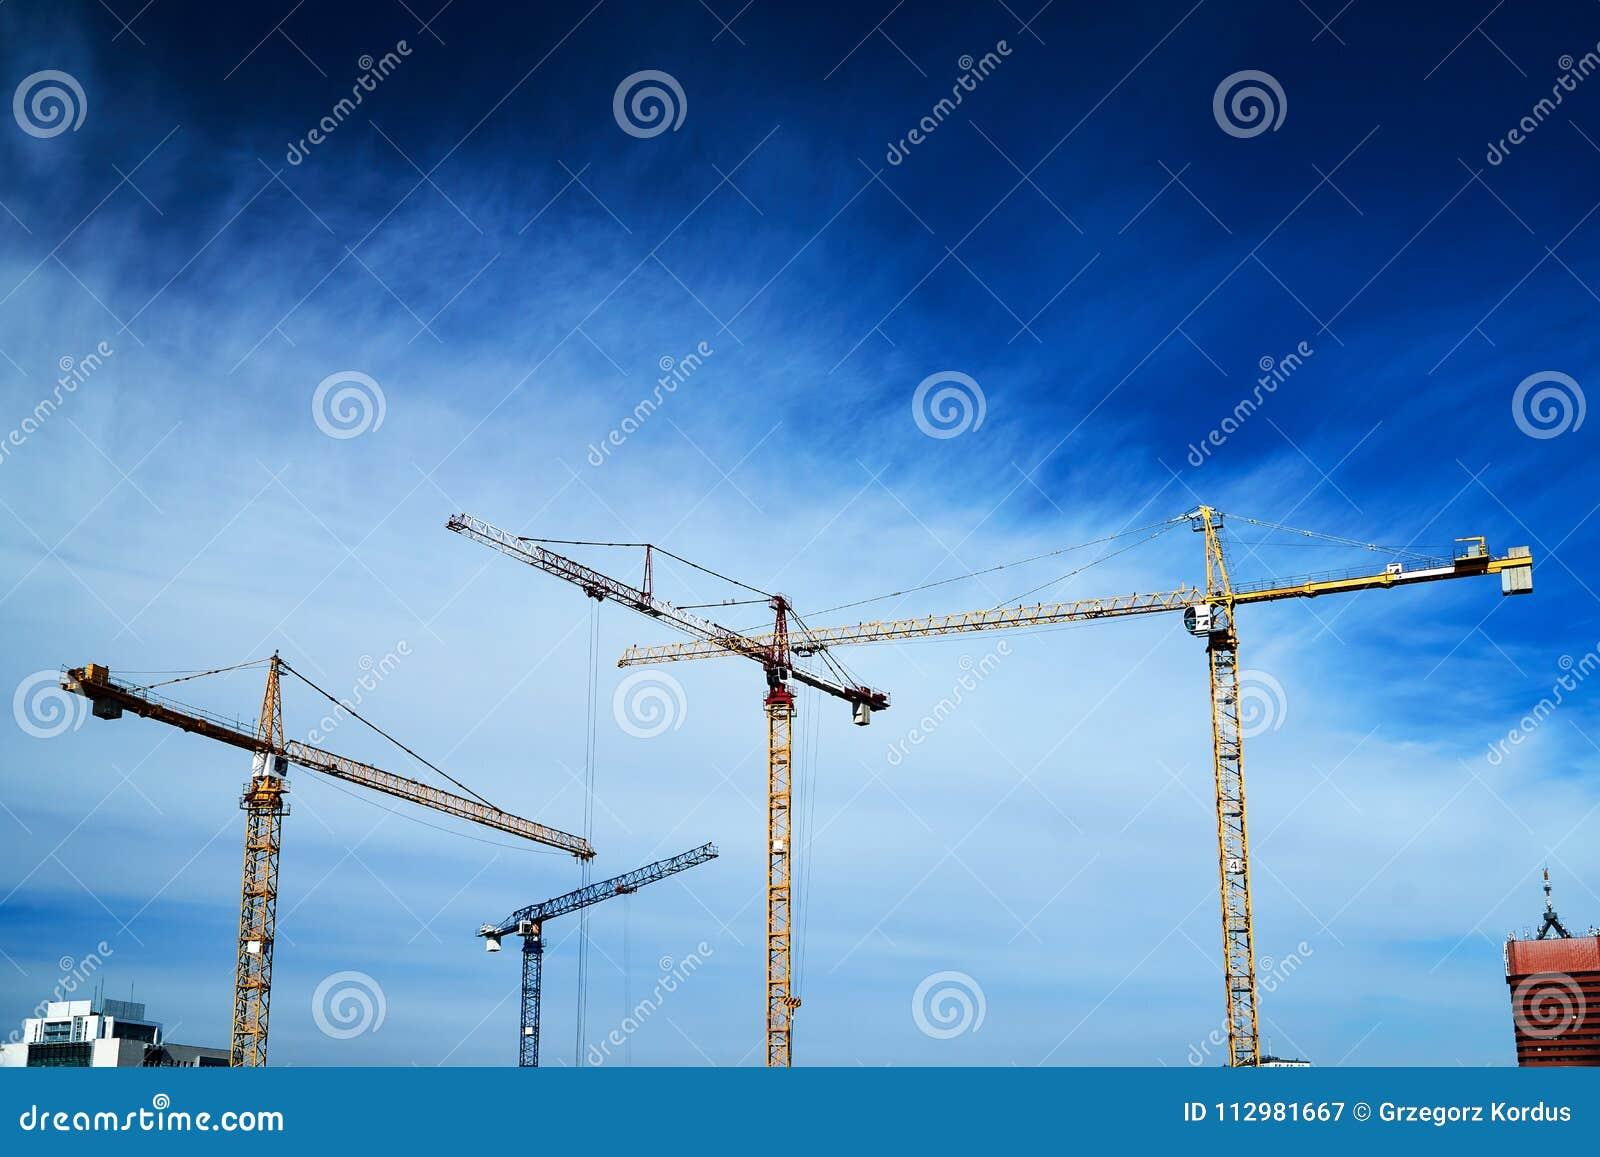 Construction crane constructions